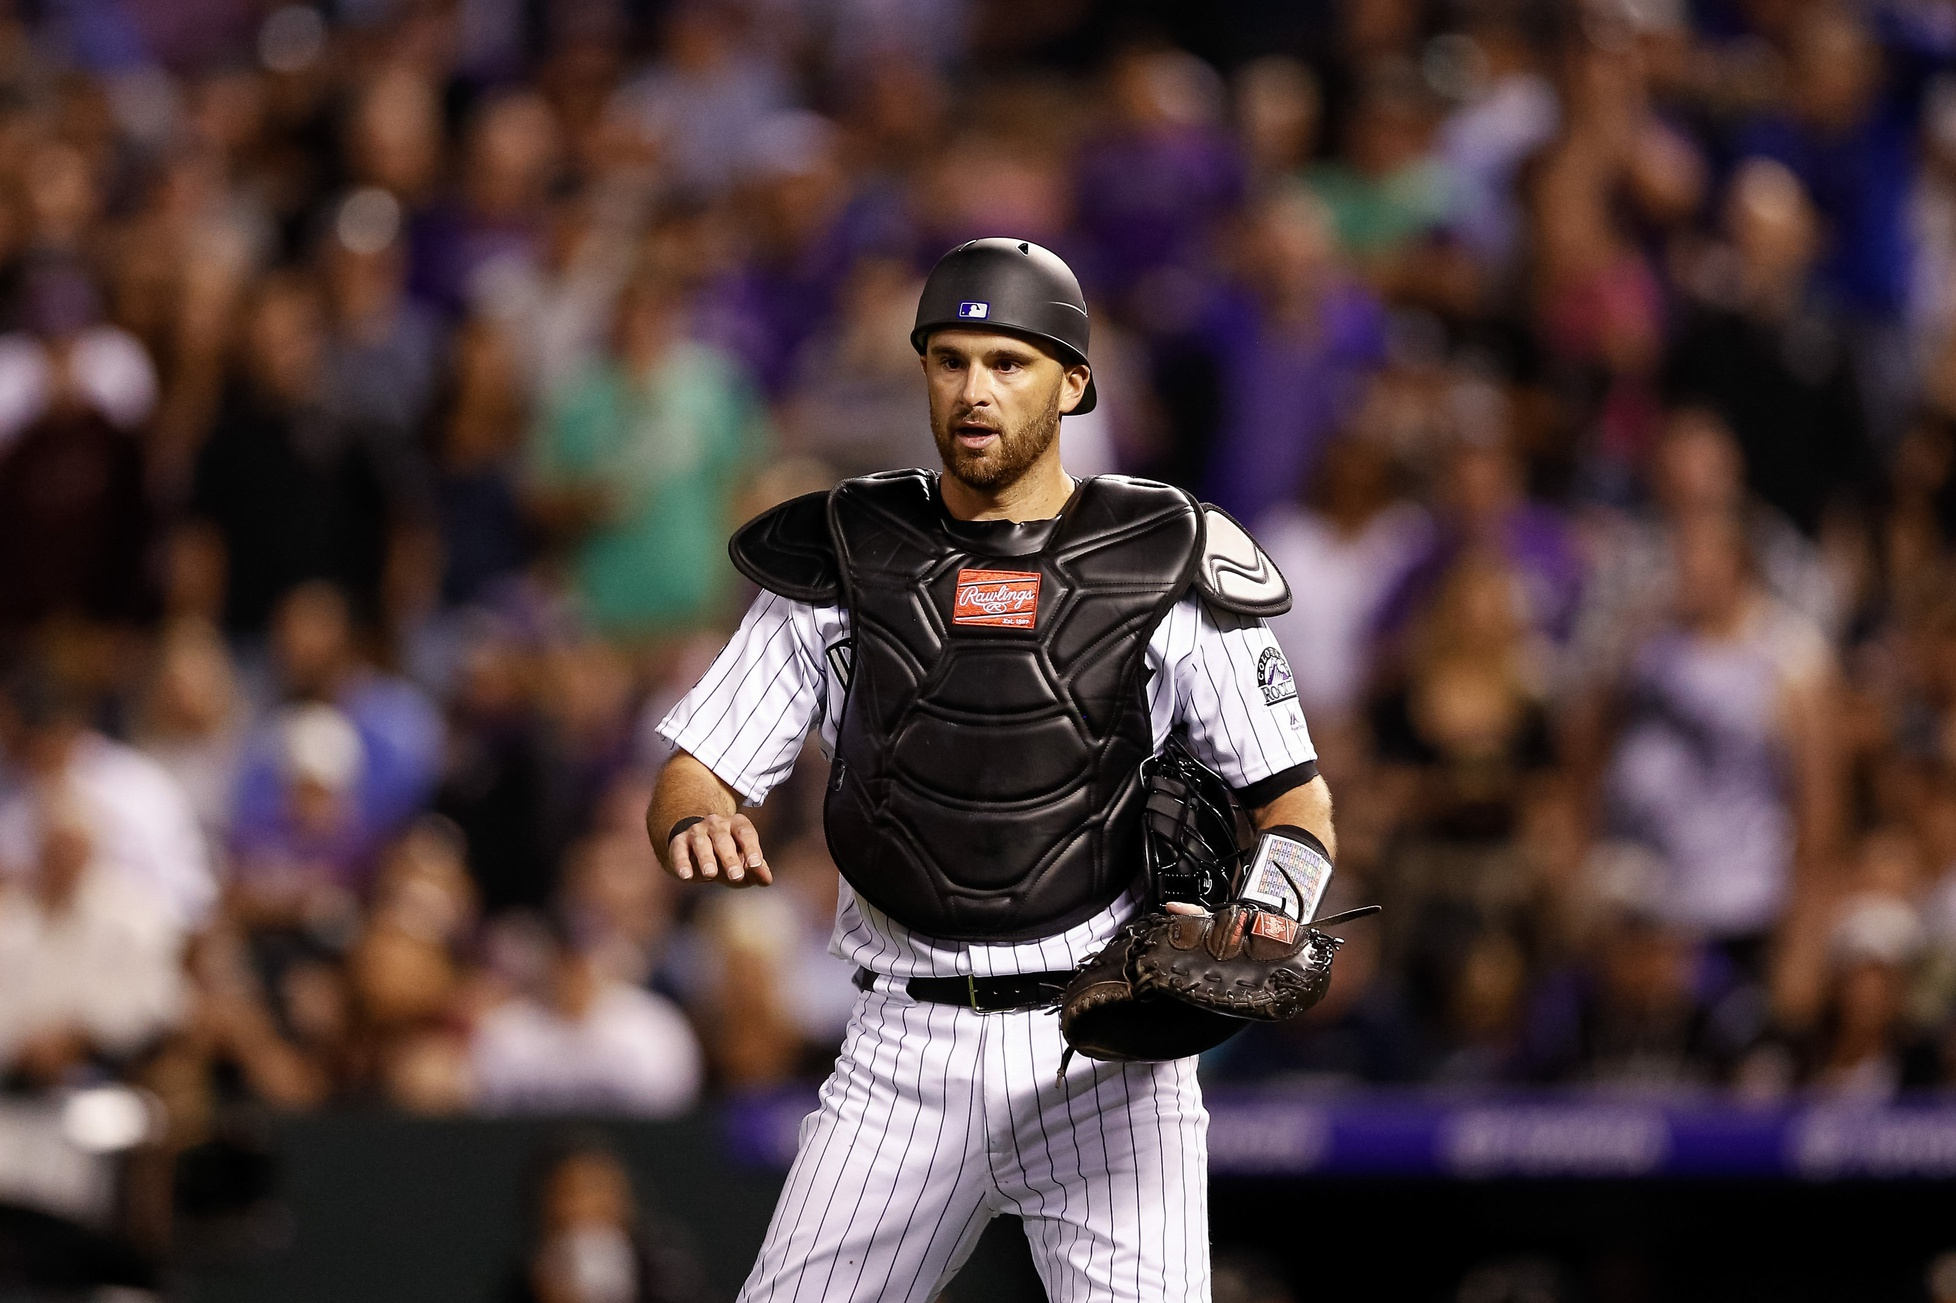 Phillies sign catcher Drew Butera to minor league deal